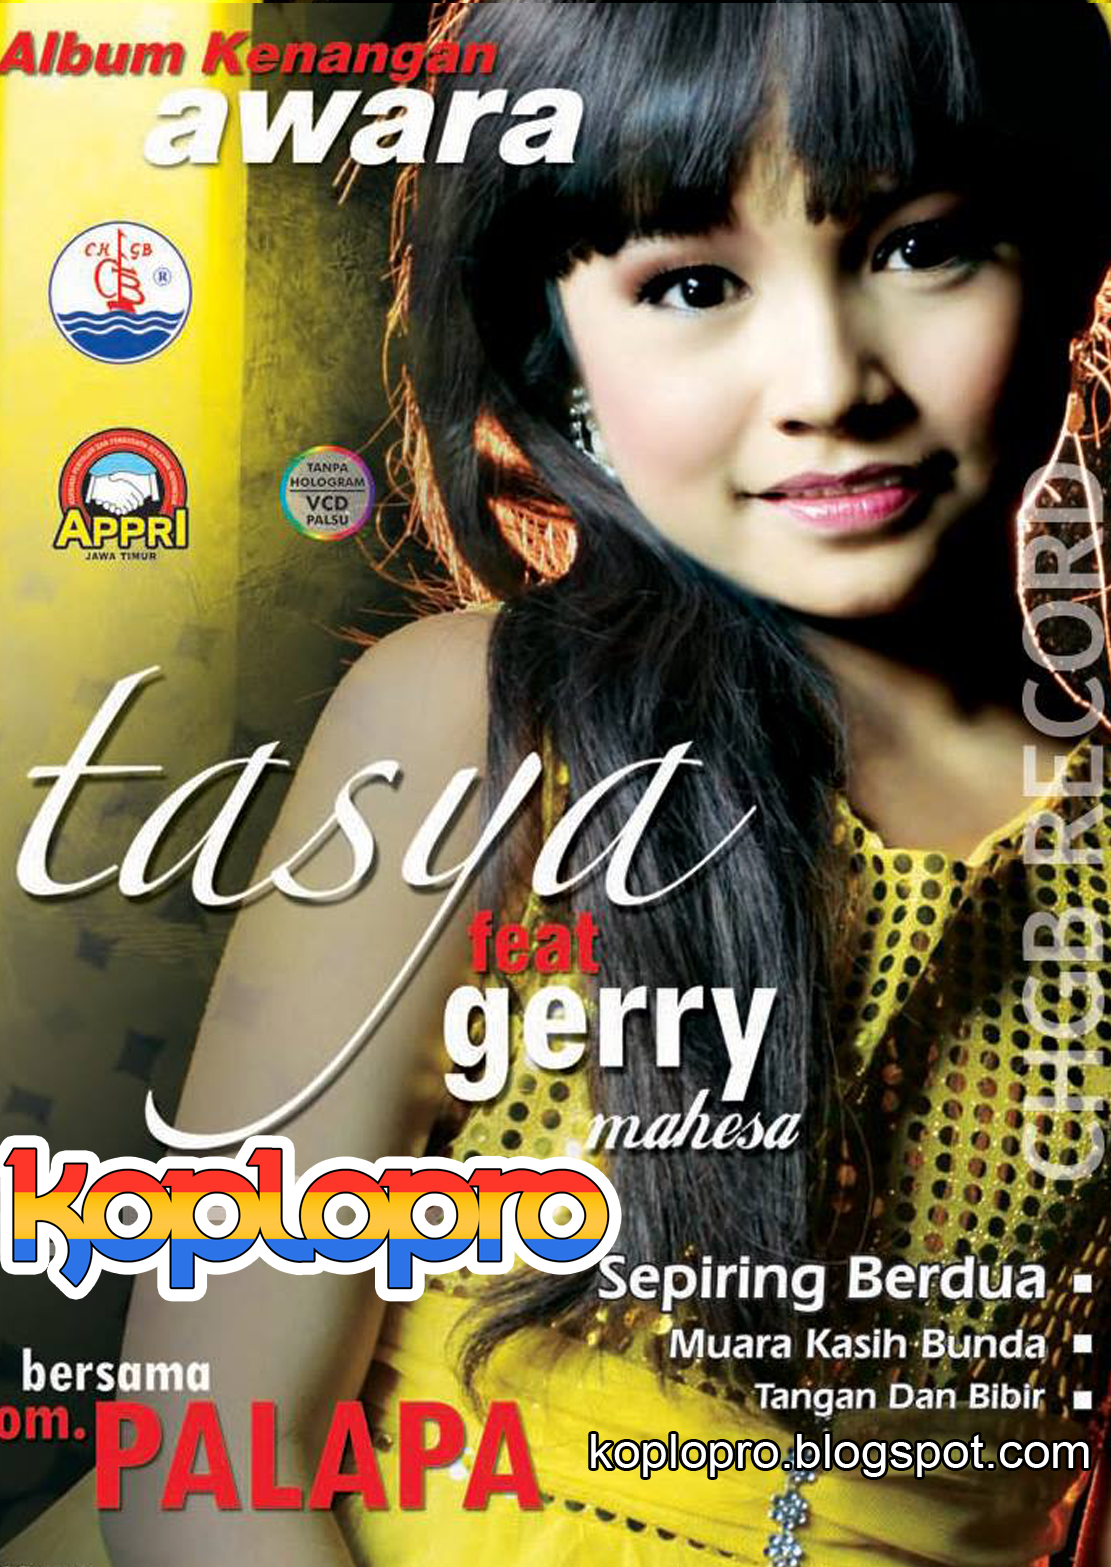 Download Tasya Rosmala - Sepiring Berdua (Palapa Album Kenangan ...